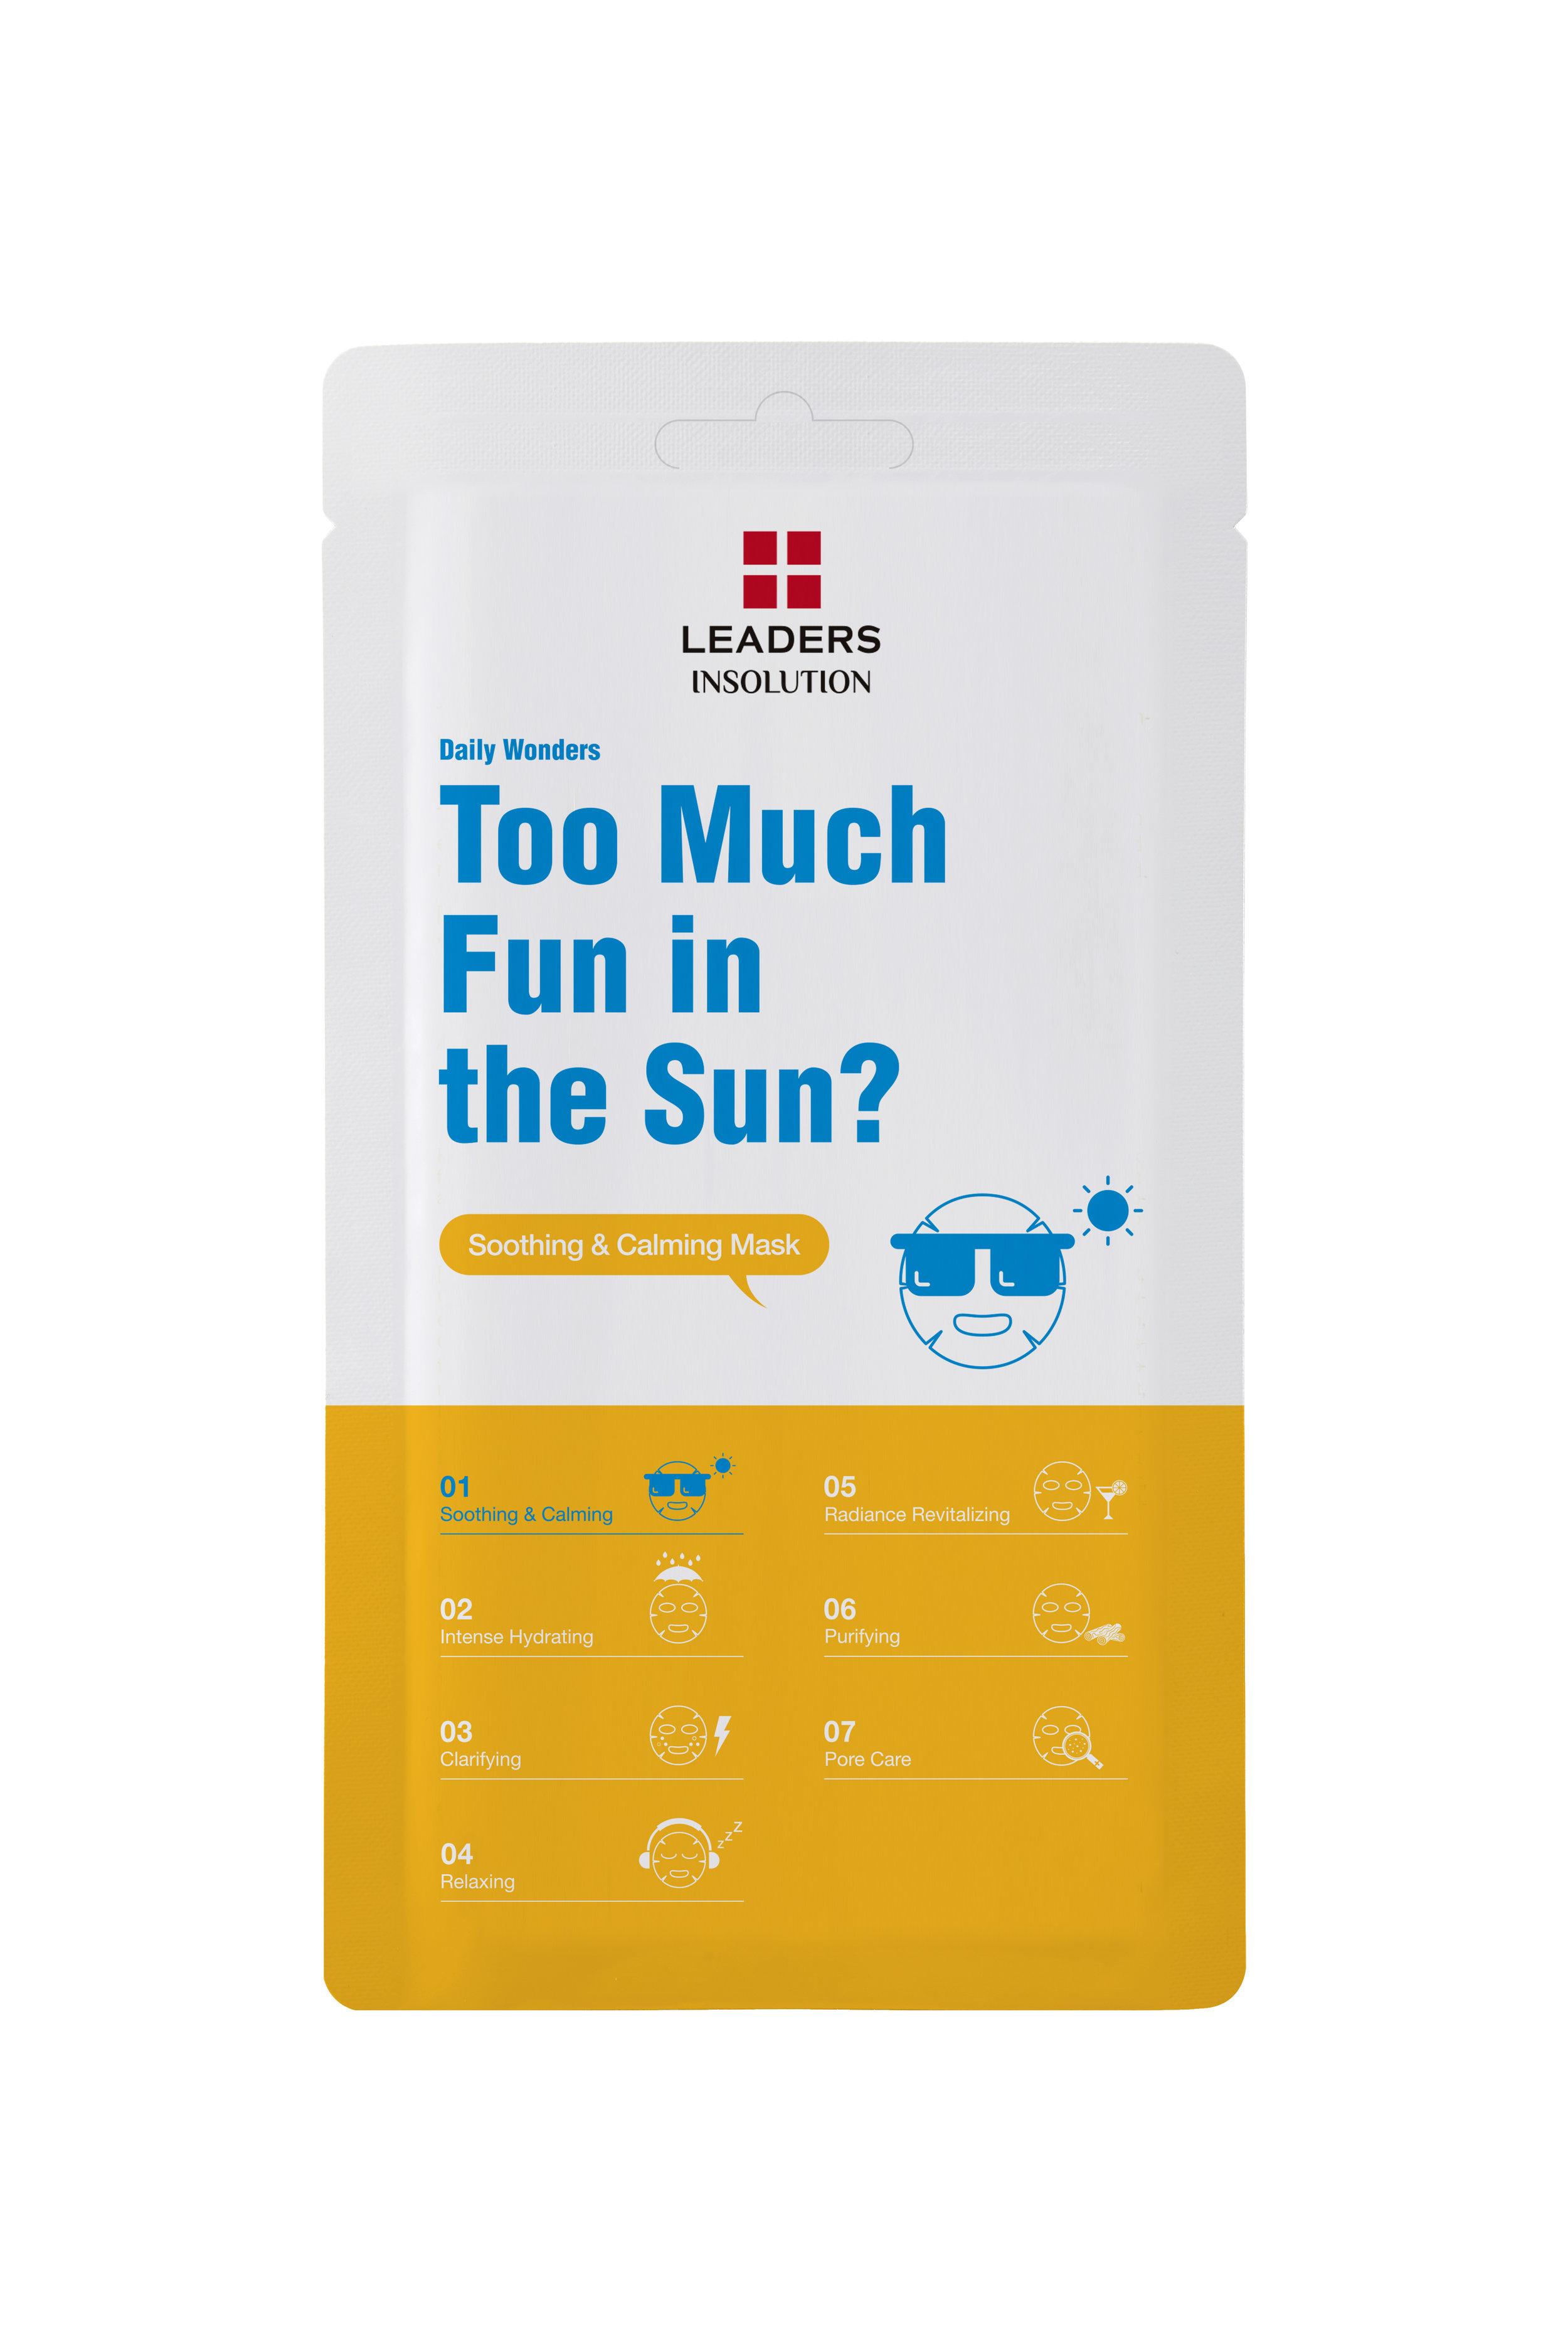 Insolution_Dailywonders_Too much fun in the sun_UNI_파우치_전면.jpg